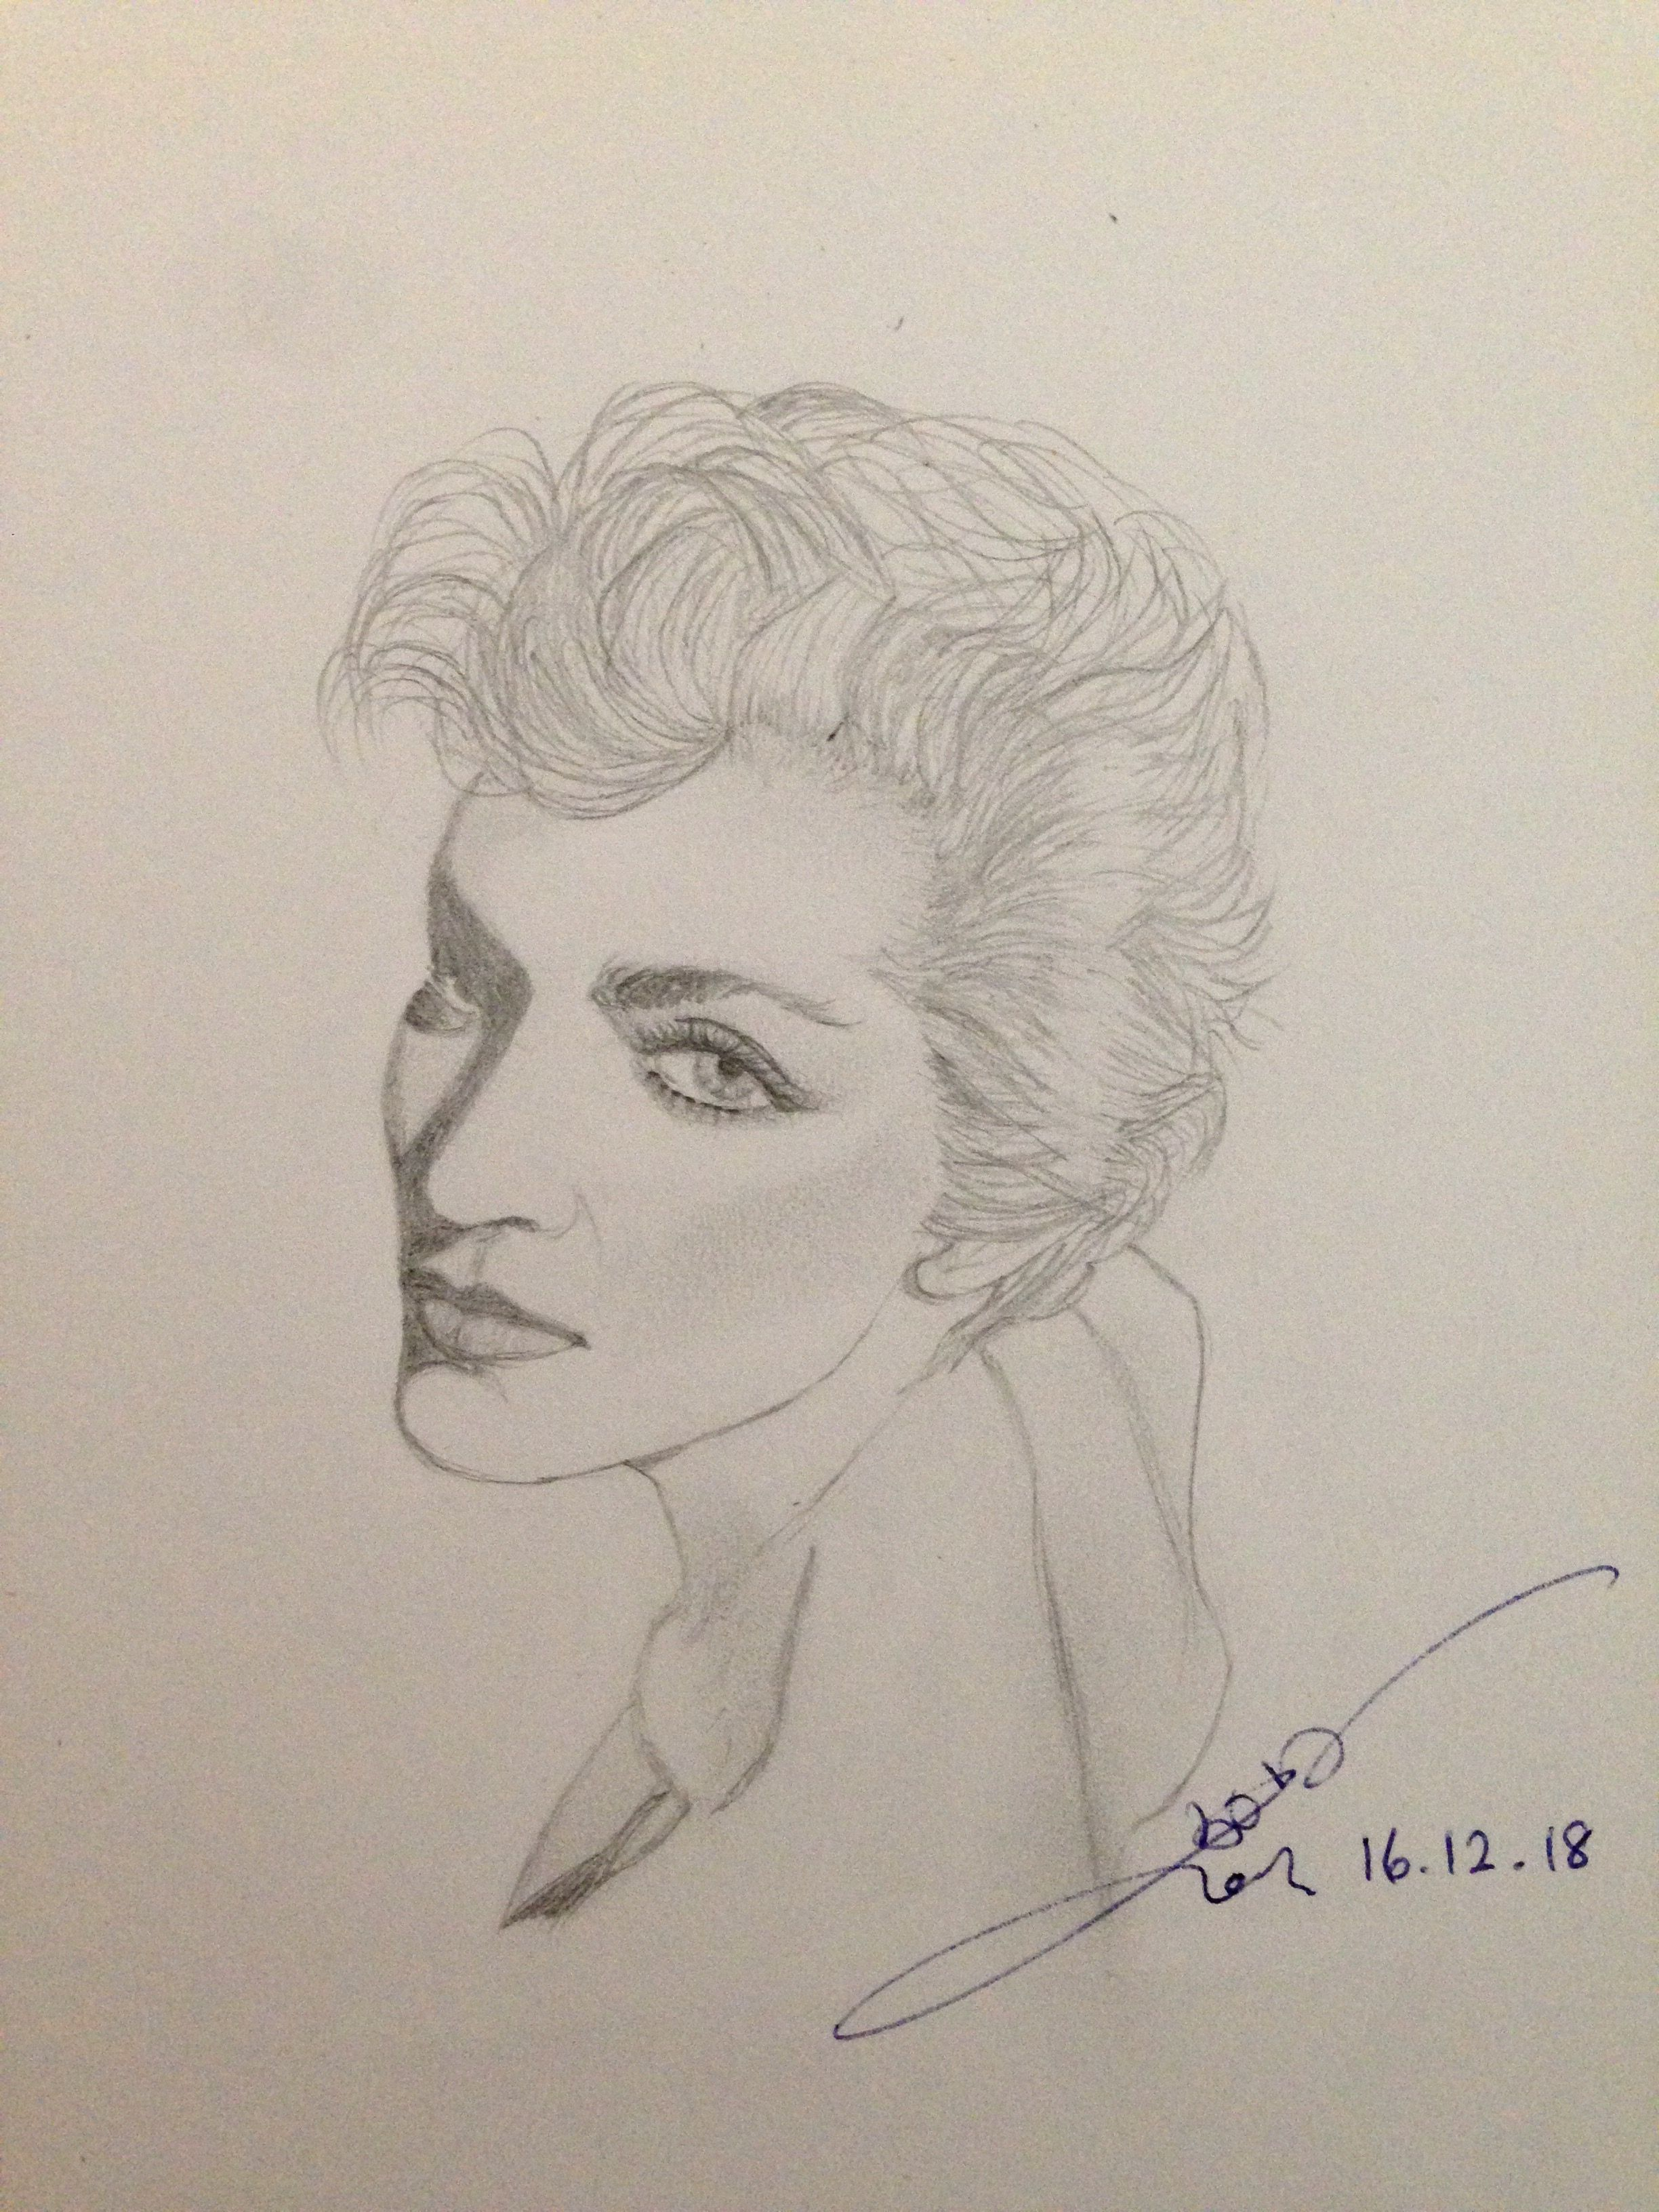 Pin on Humble sketch